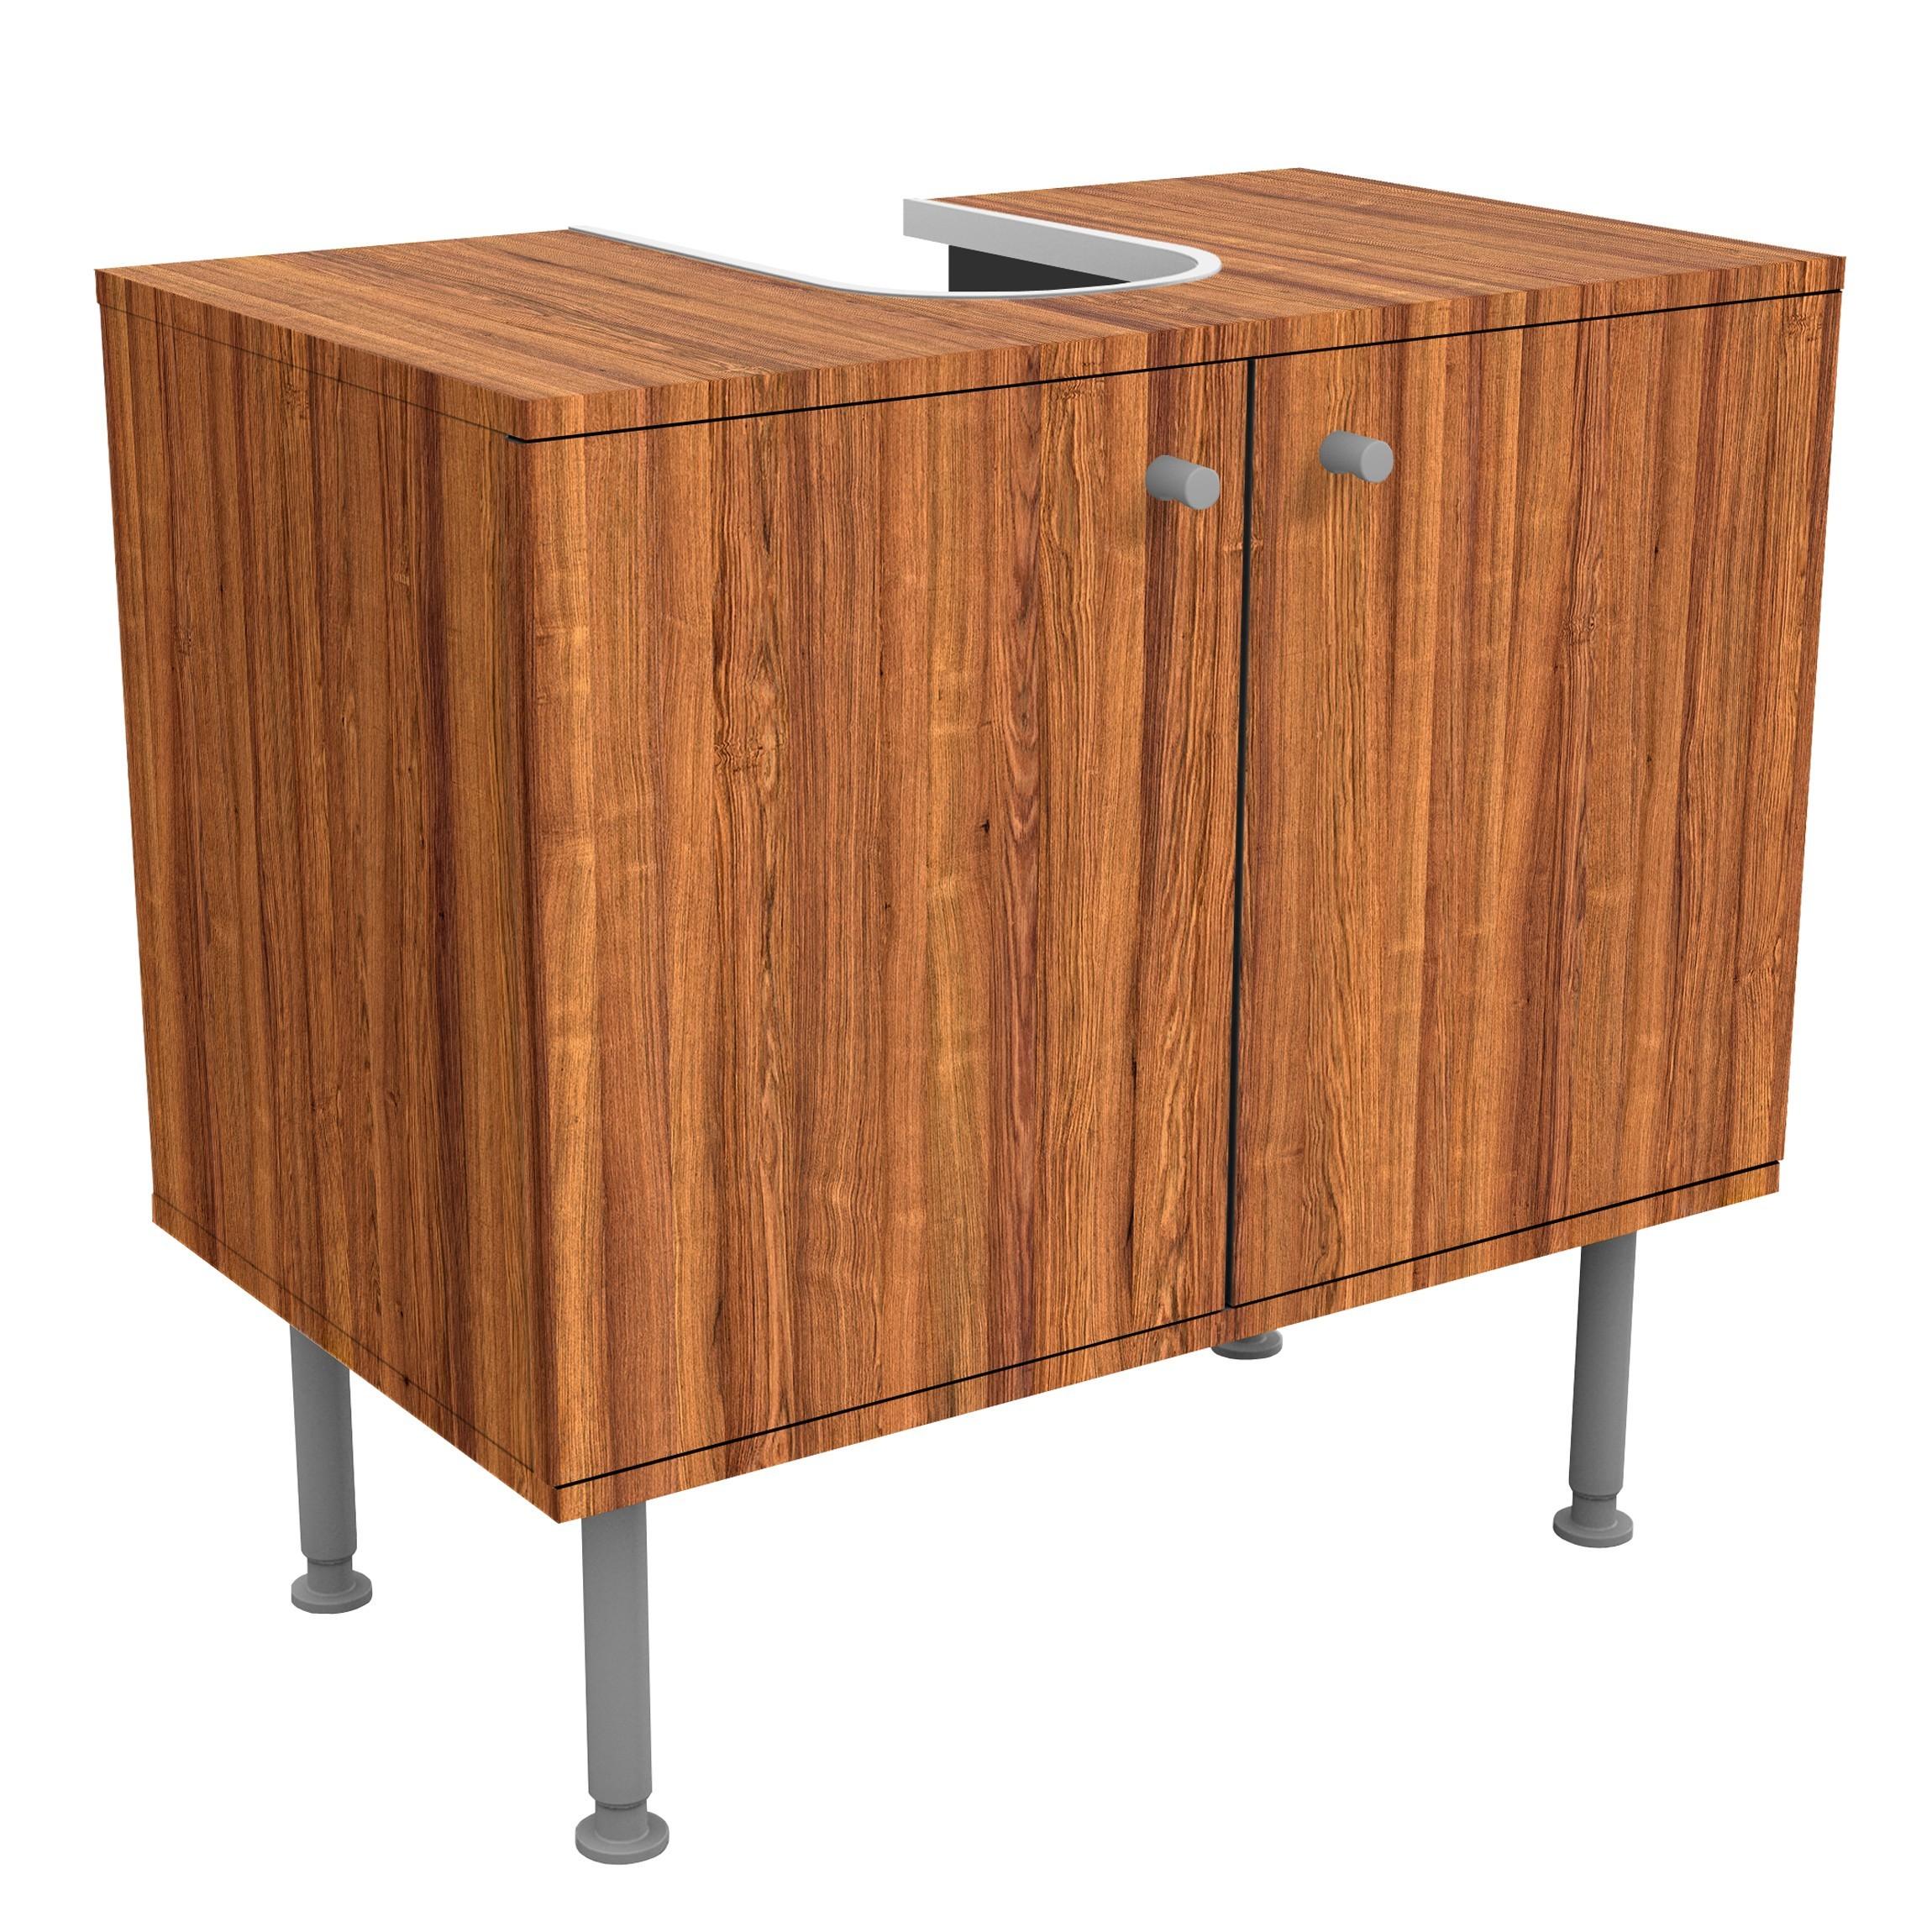 waschbeckenunterschrank holz freijo holzoptik badschrank braun. Black Bedroom Furniture Sets. Home Design Ideas